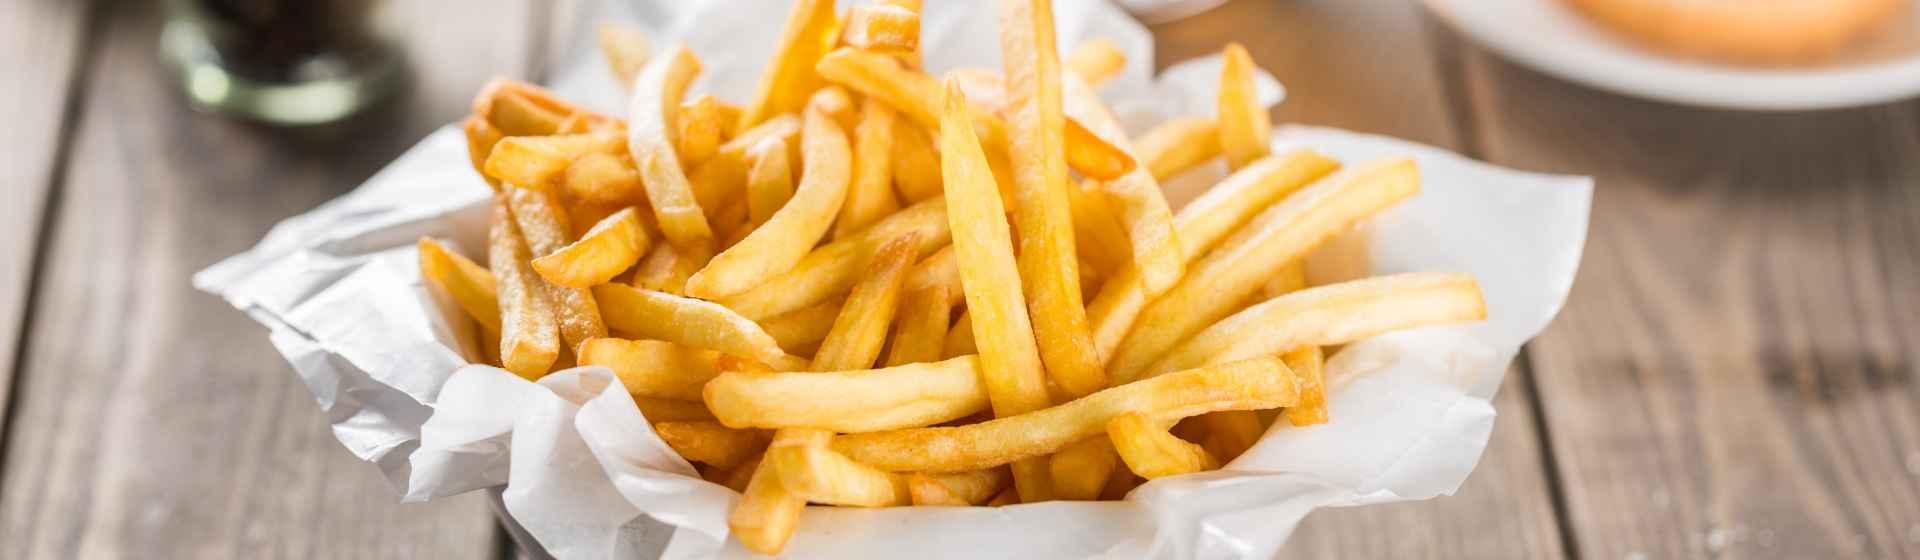 Como fazer batata frita na airfryer?